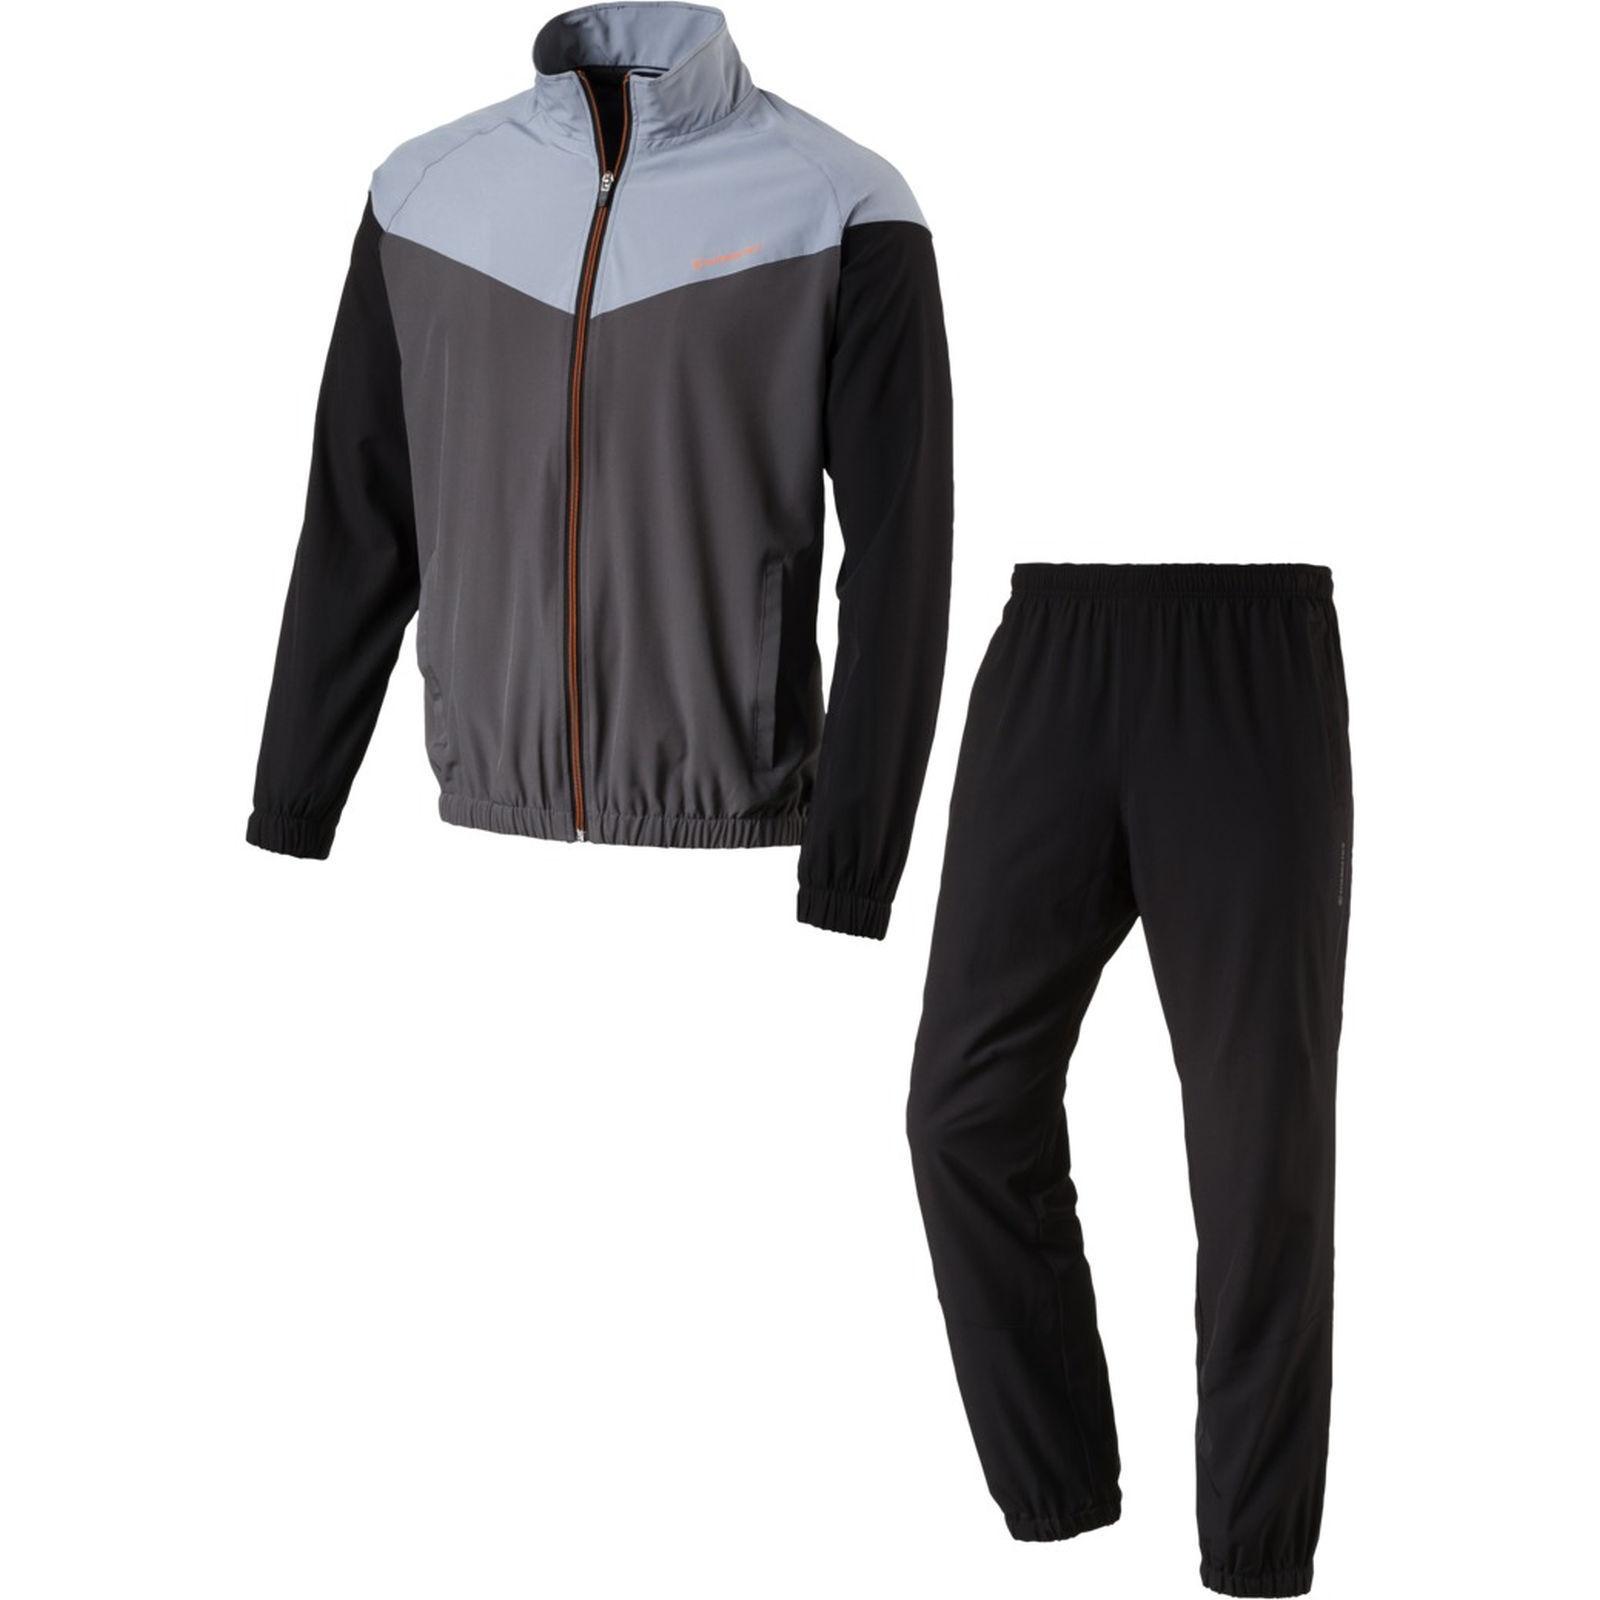 Energetics Herren Trainingsanzug FINLEY + FLO  grau schwarz Kurzgrößen